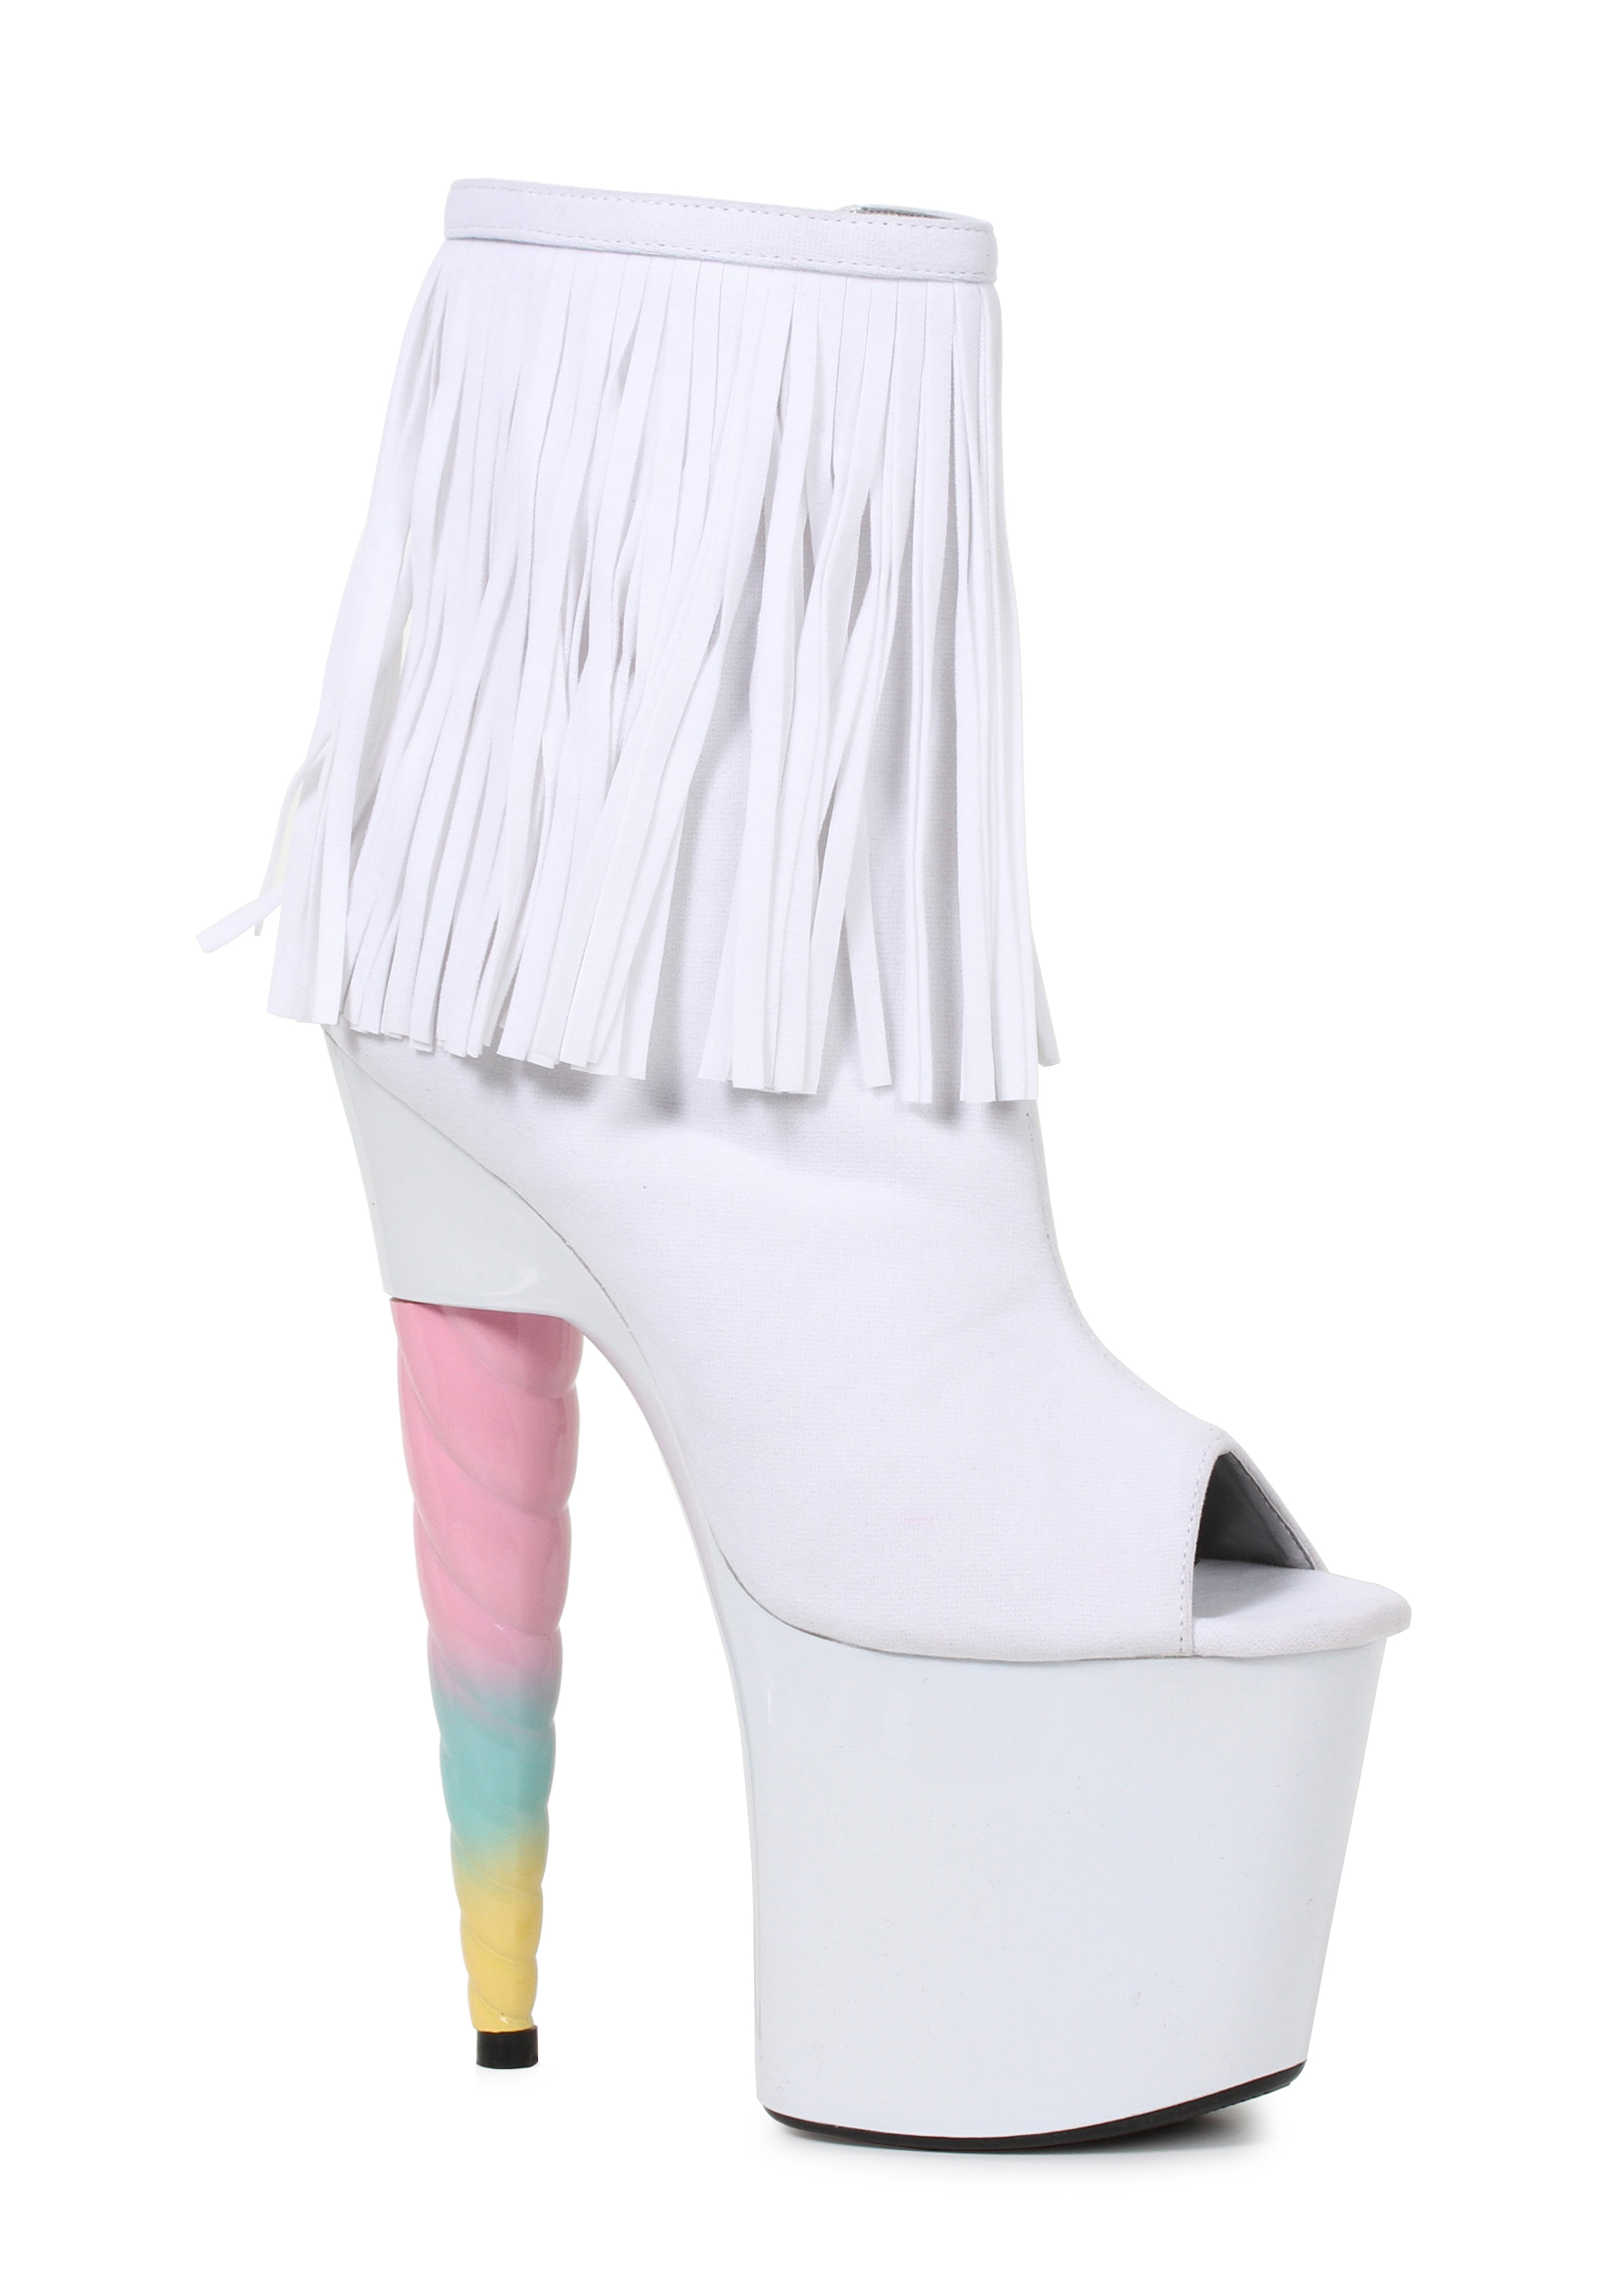 Ellie-Shoes-777-PRINCE-7-Inch-Unicorn-Heel-Platform-Bootie-With-Fringe thumbnail 3